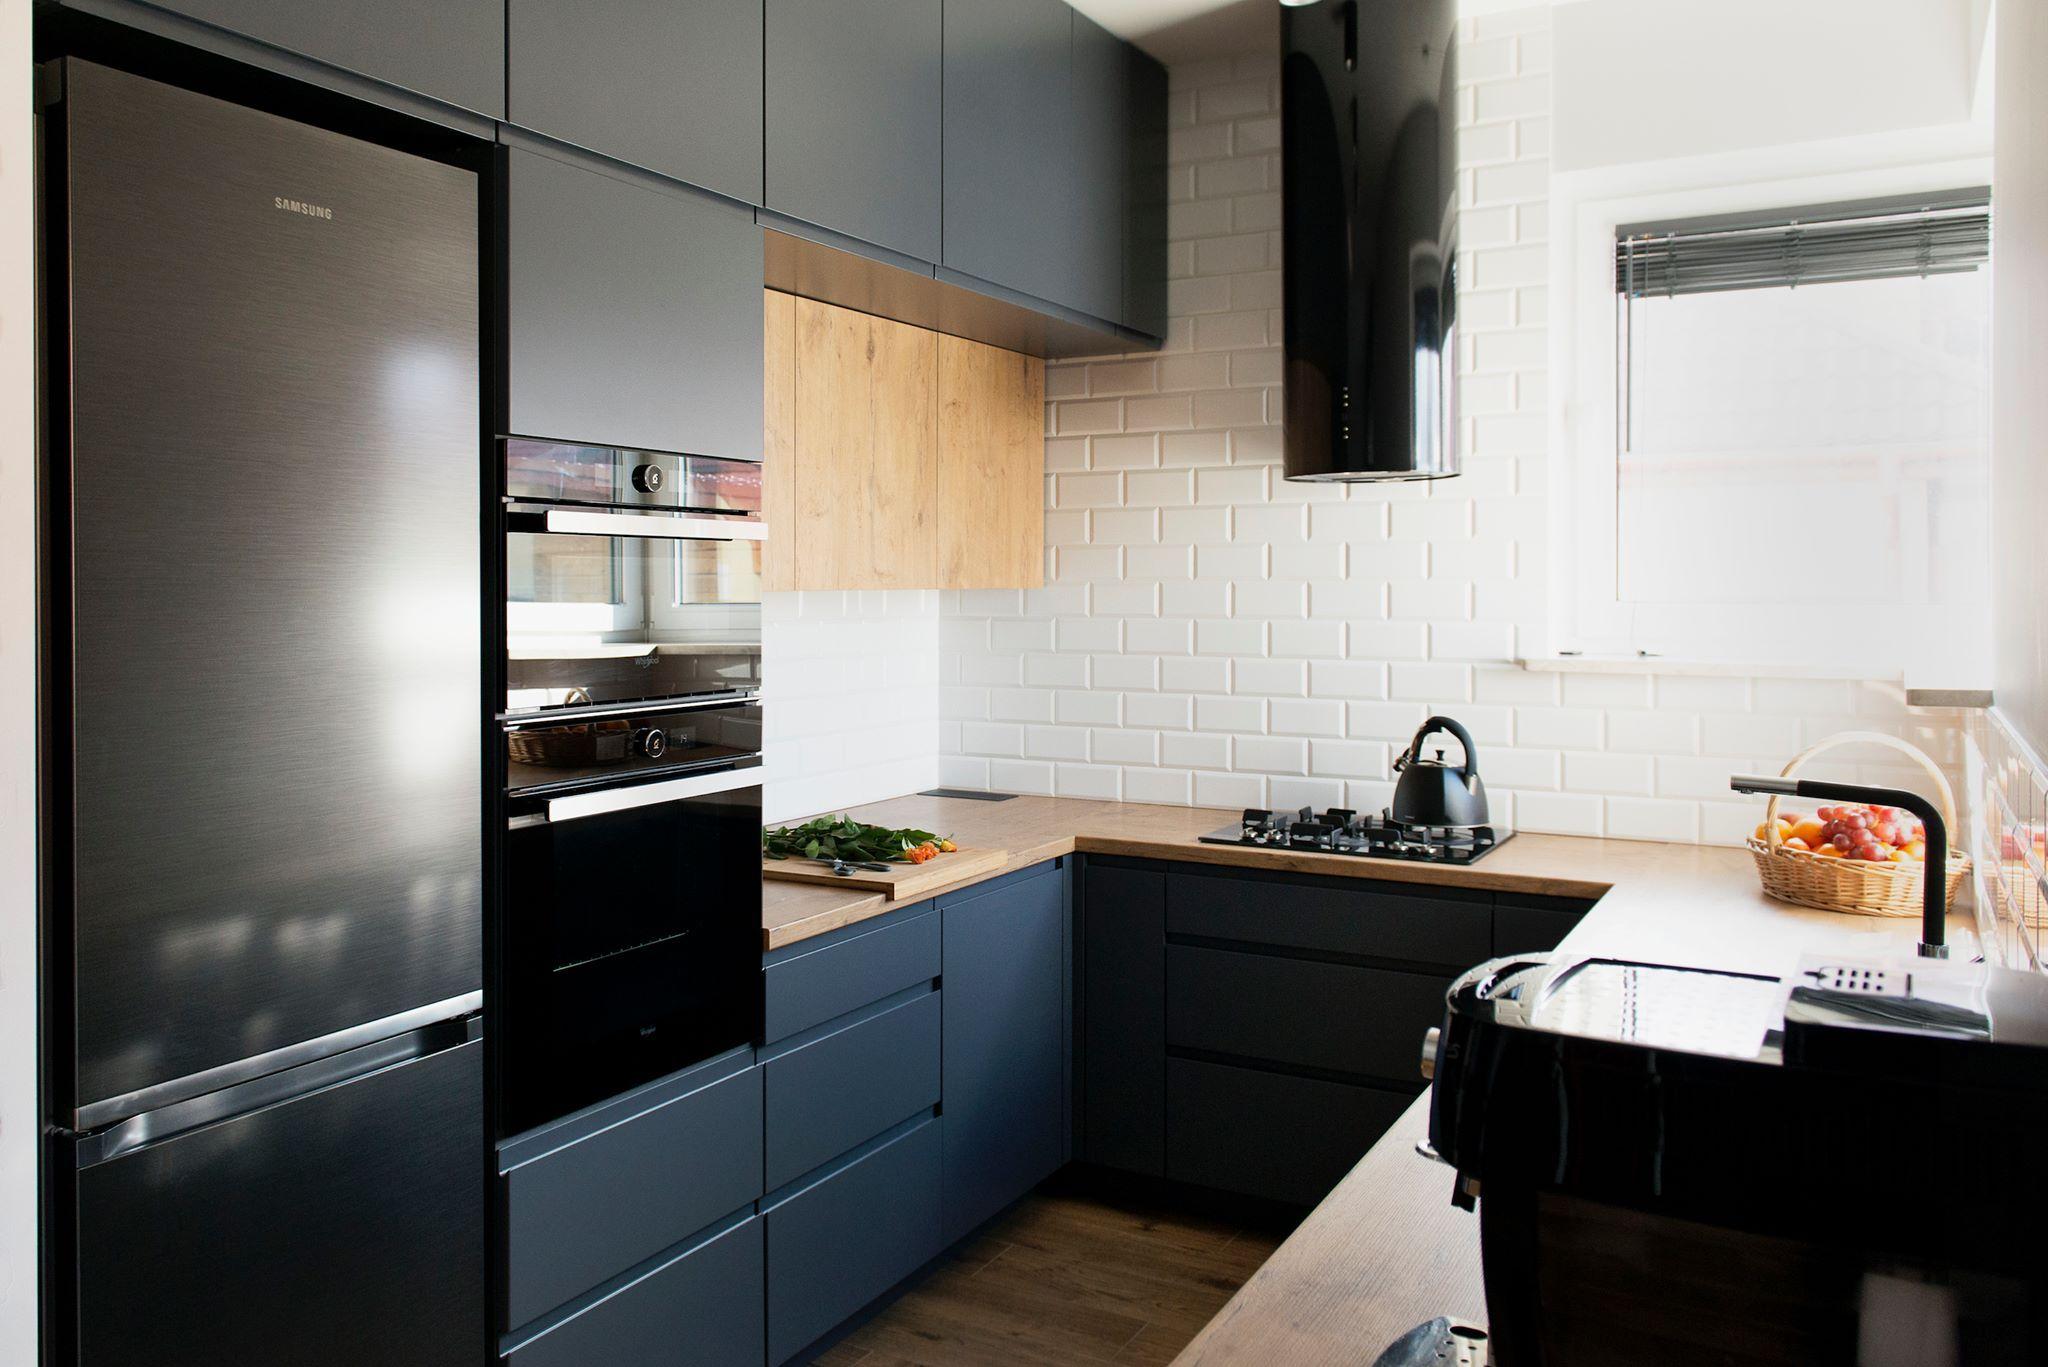 Okap Kominowy Cylindro Or Black Nortberg In 2021 Modern Kitchen Kitchen Design Minimalist Apartment Decor